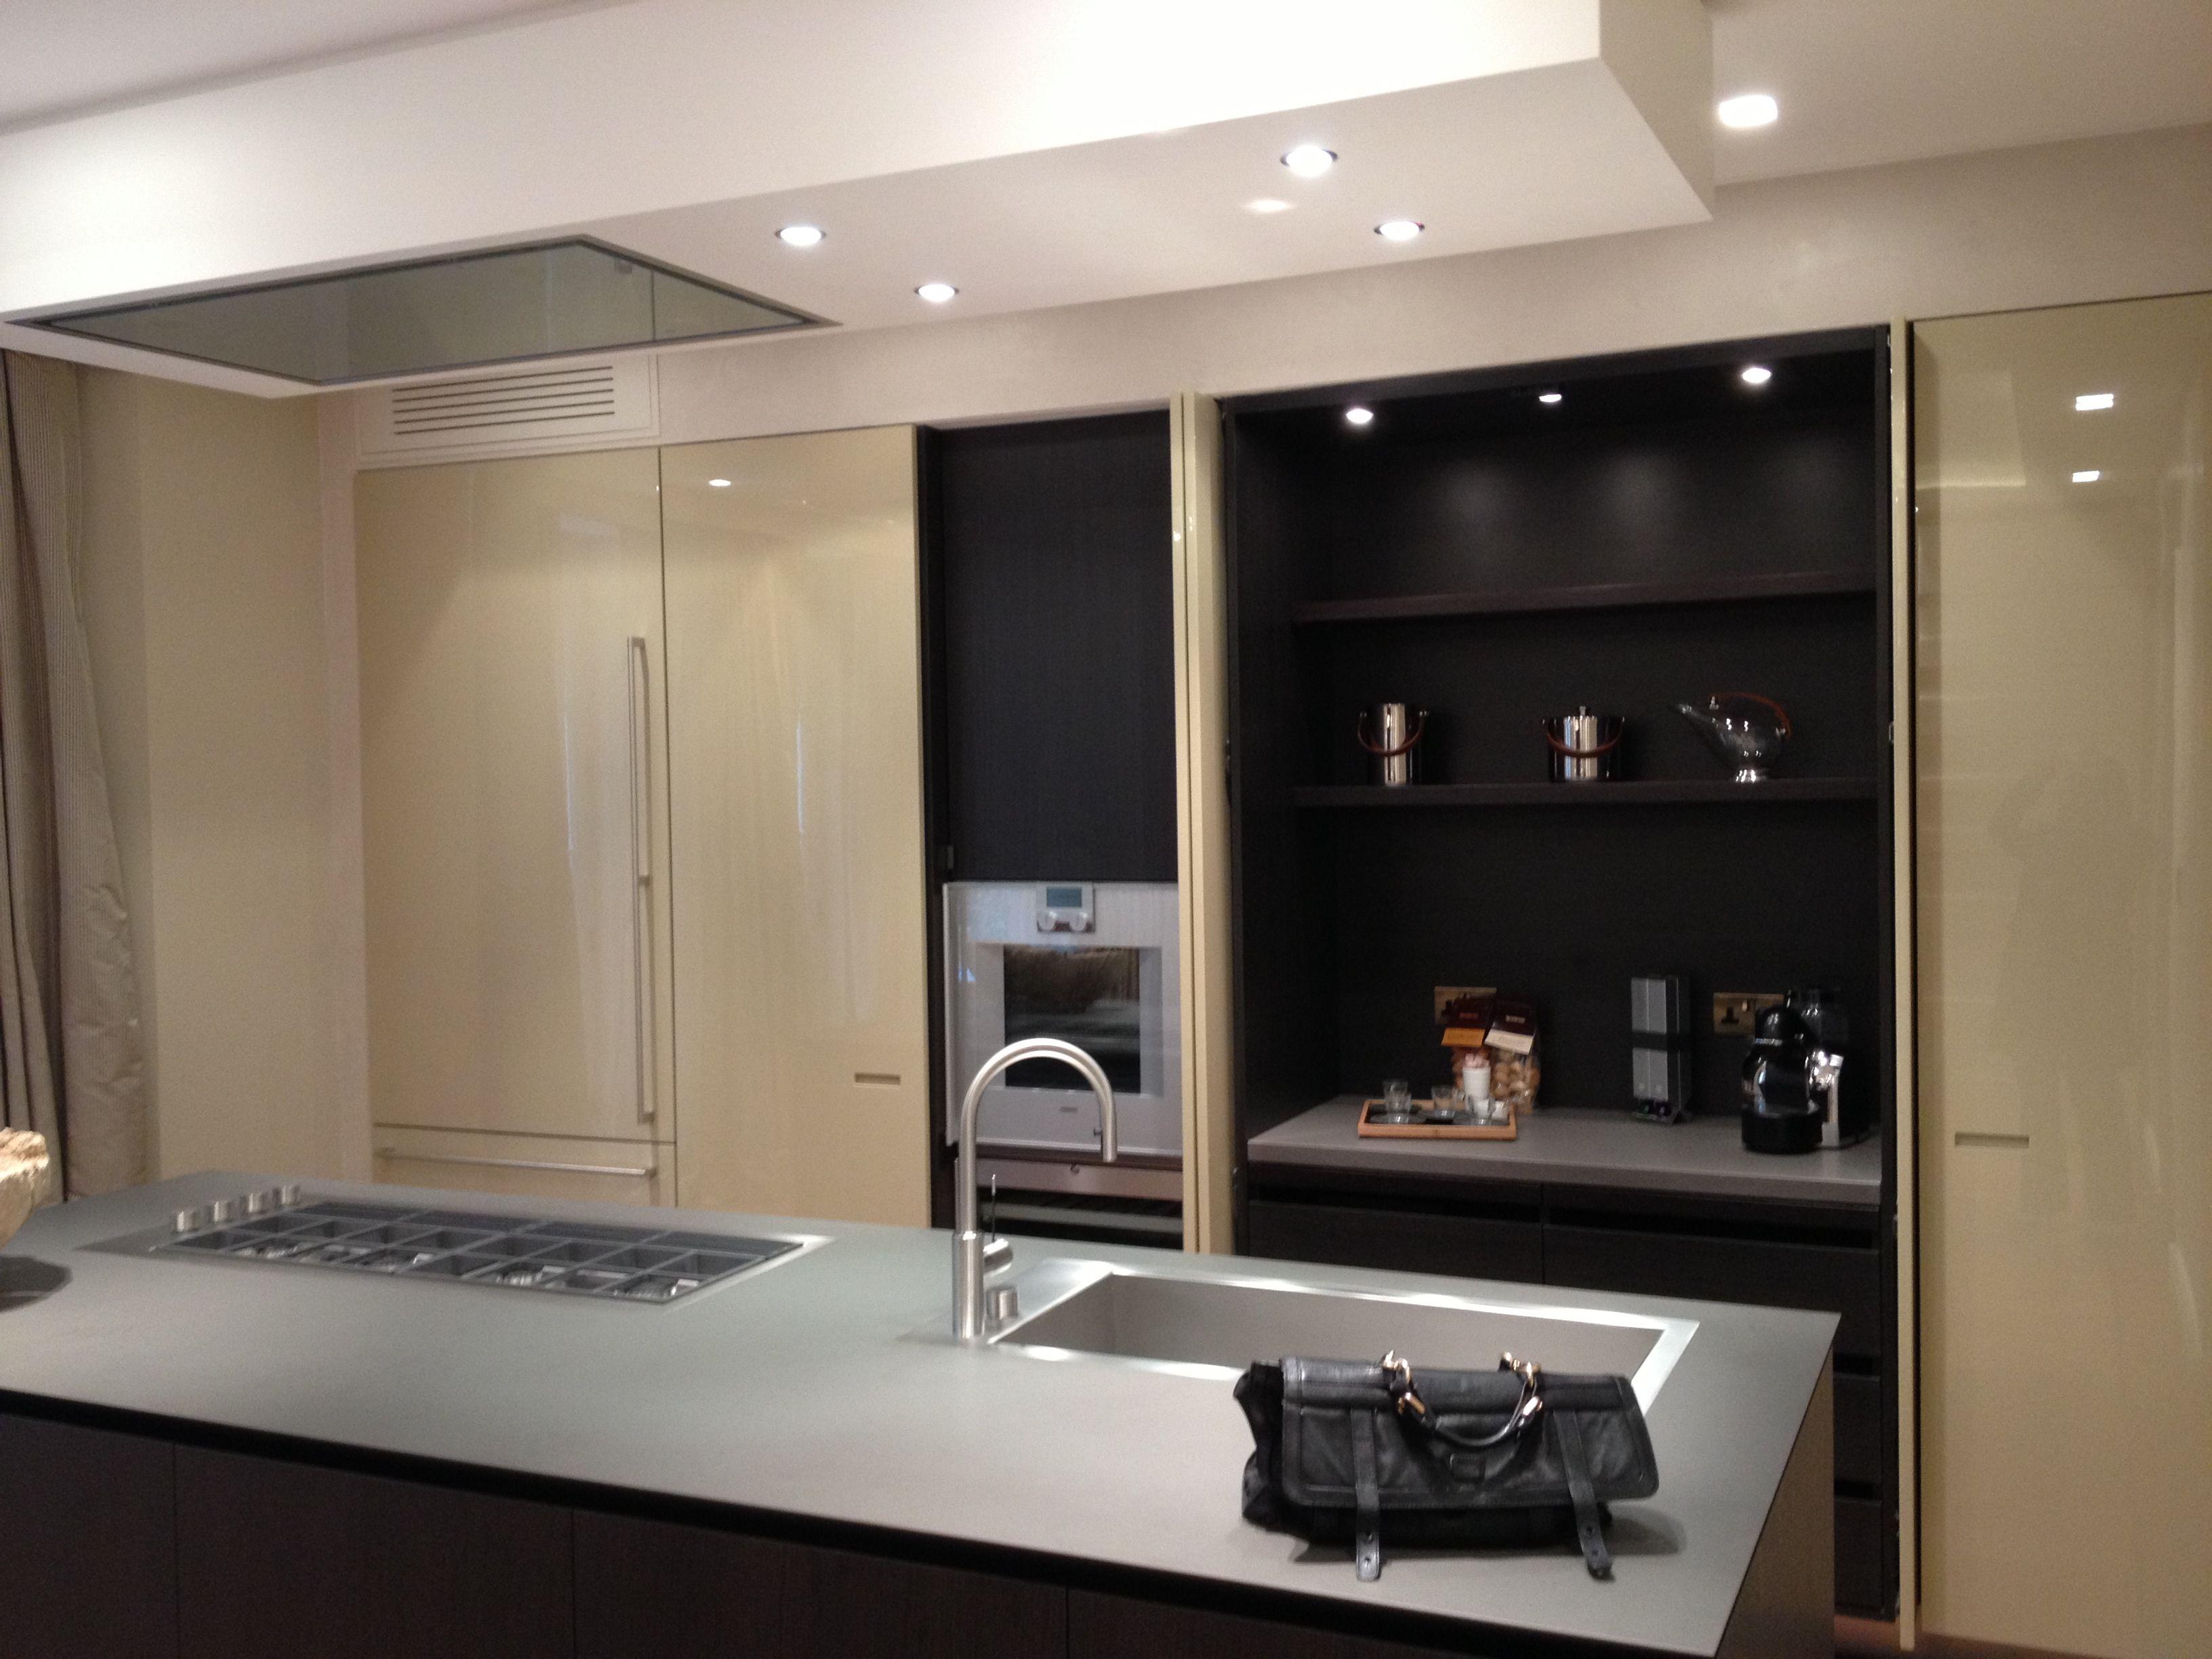 Delicieux Mayfair Kitchen